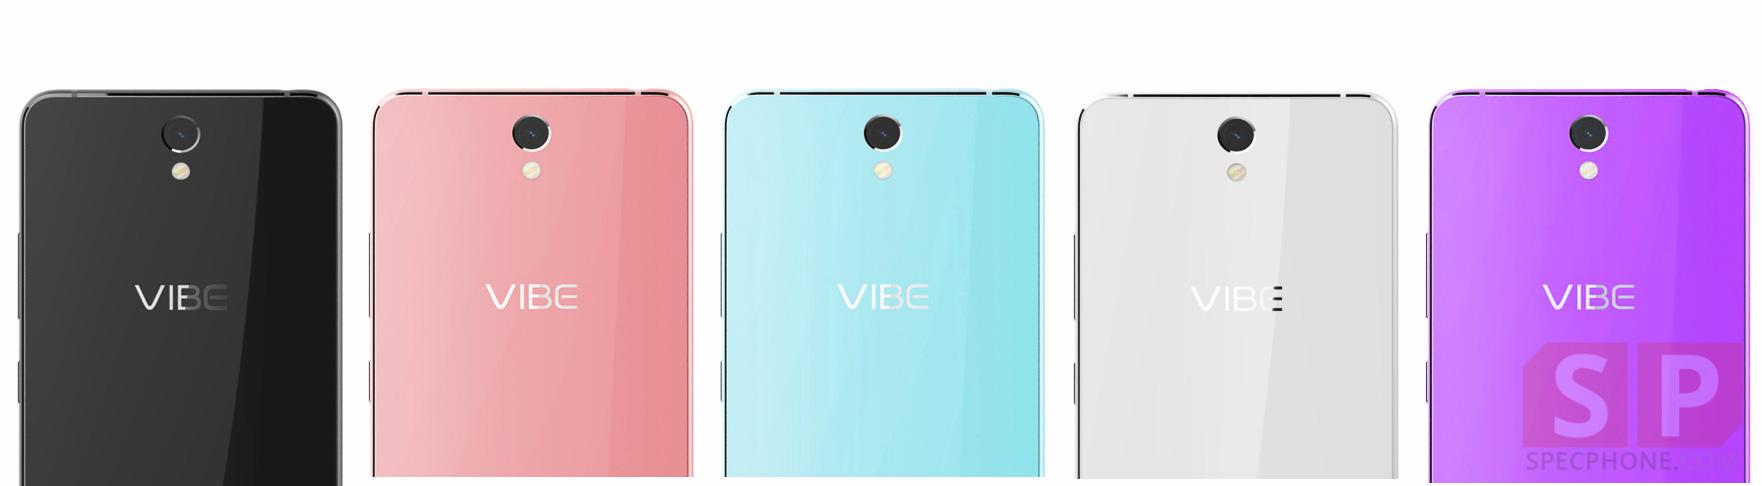 lenovo-VIBE-2015-SpecPhone-016